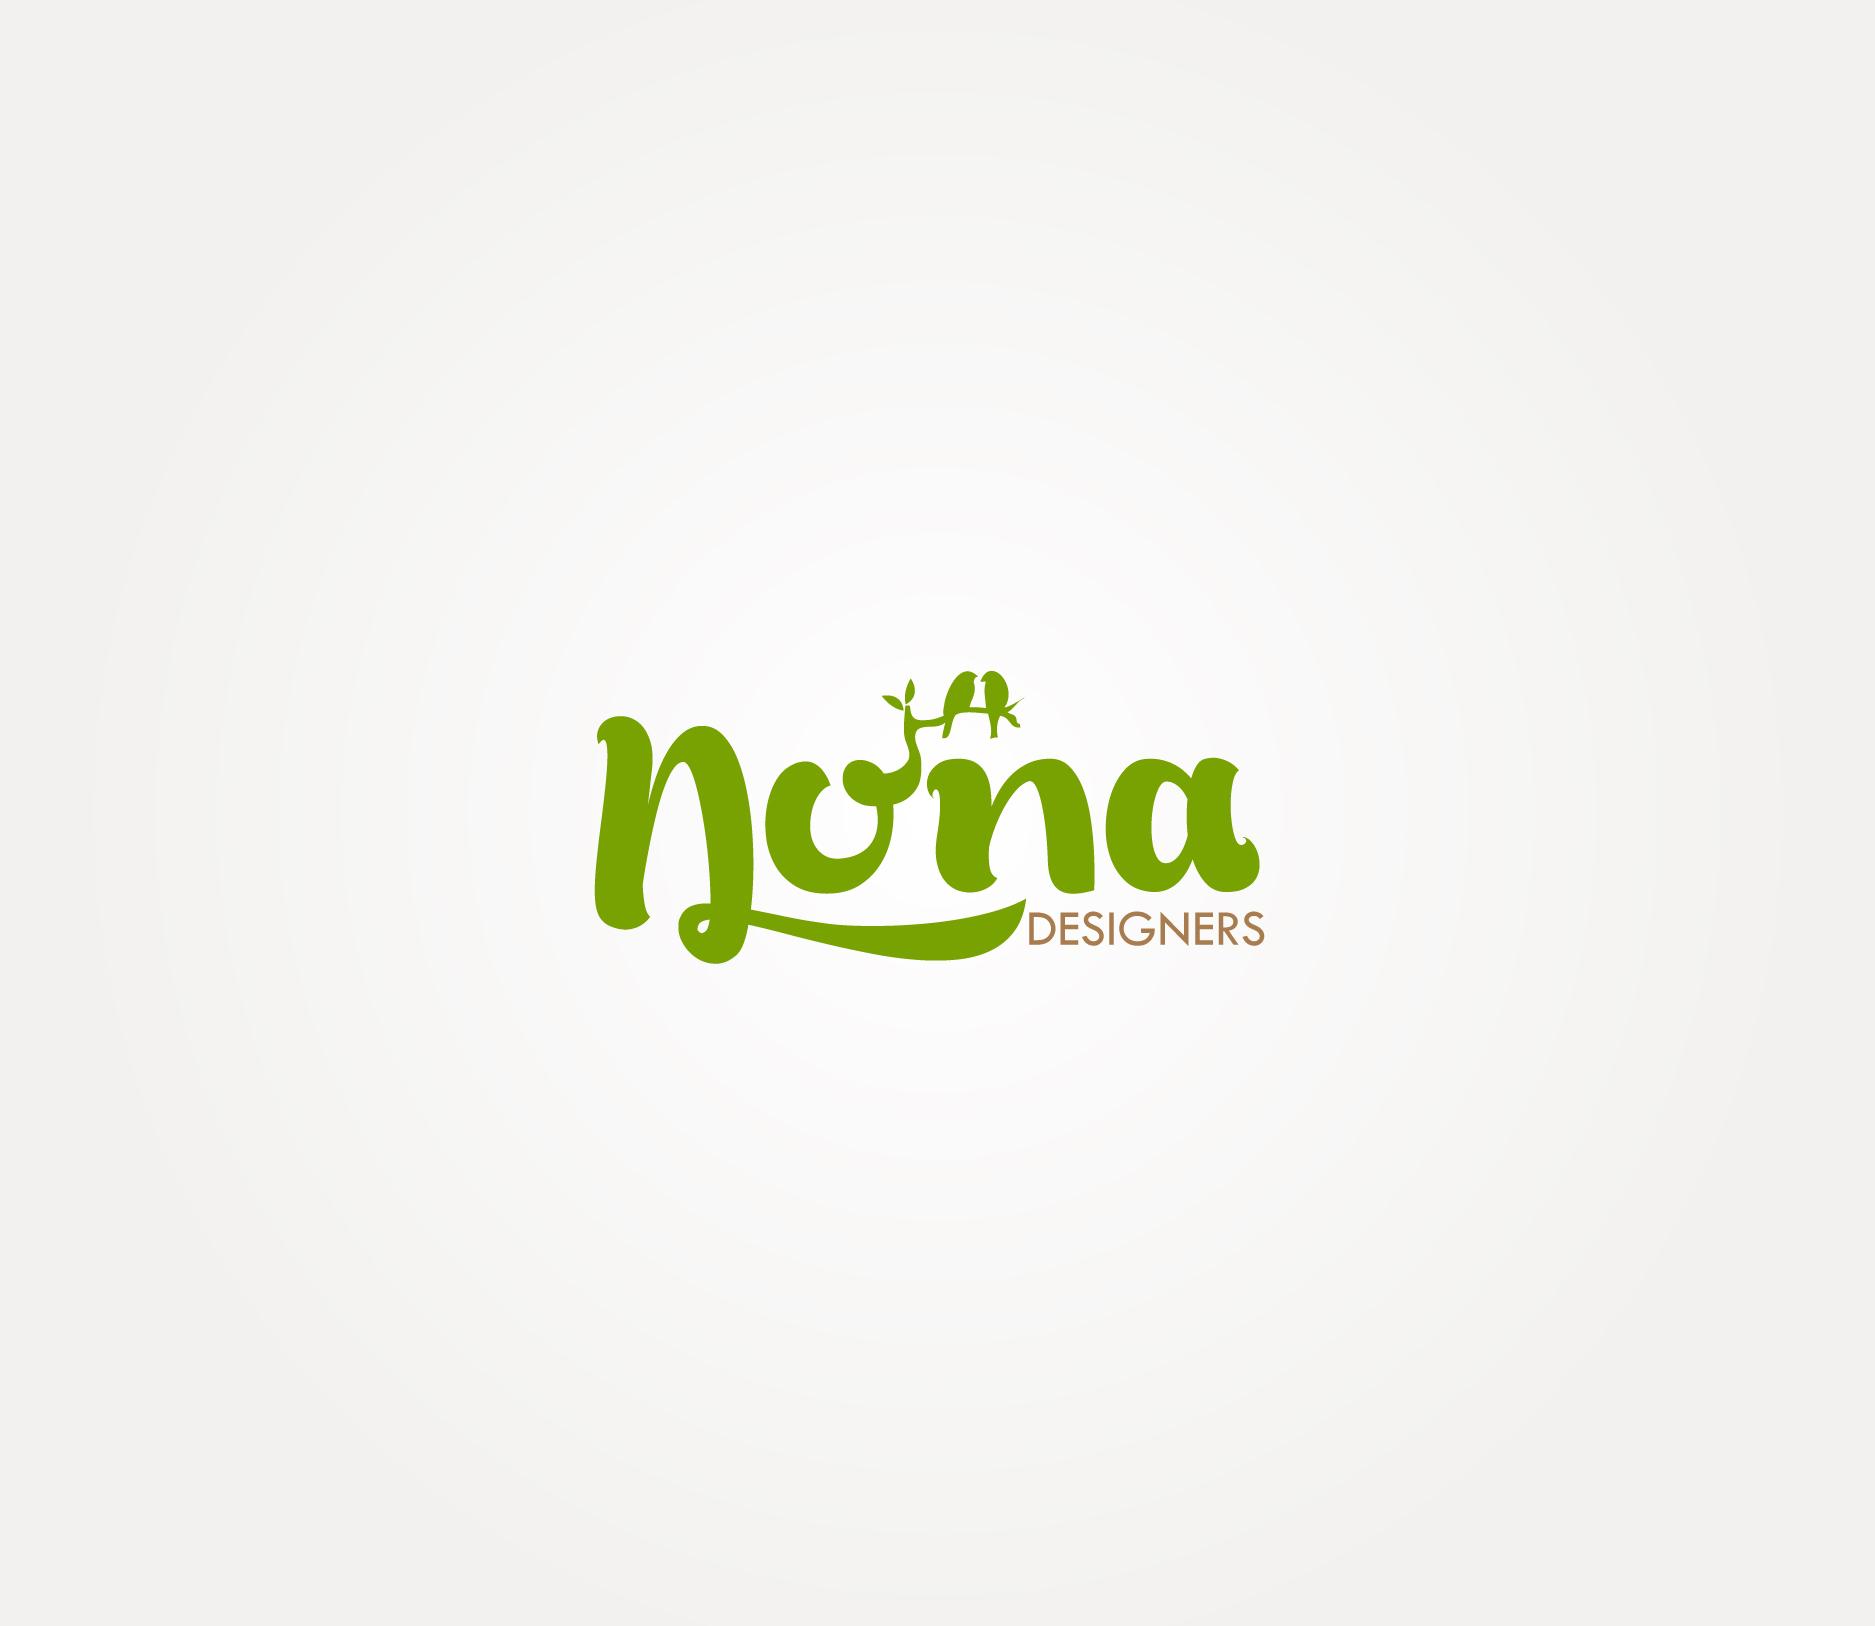 Logo Design Contests Unique Logo Design Wanted For Nona Designers Design No 47 By Squaredot Hiretheworld